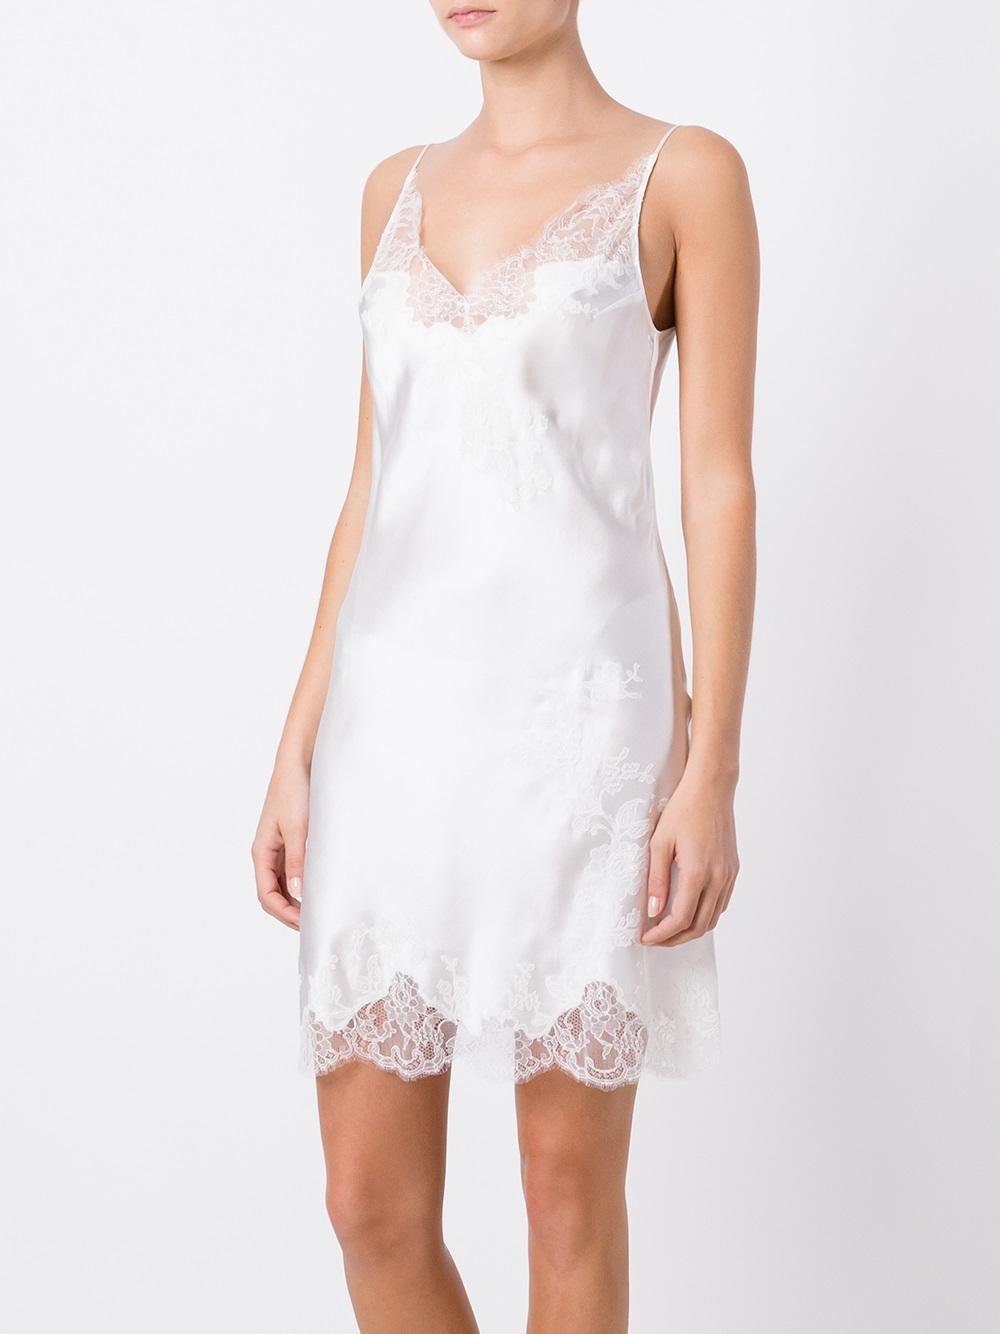 Carine Gilson White Lace V Neck Slip Lace Slip Dress White Lace Slip Dress [ 1334 x 1000 Pixel ]